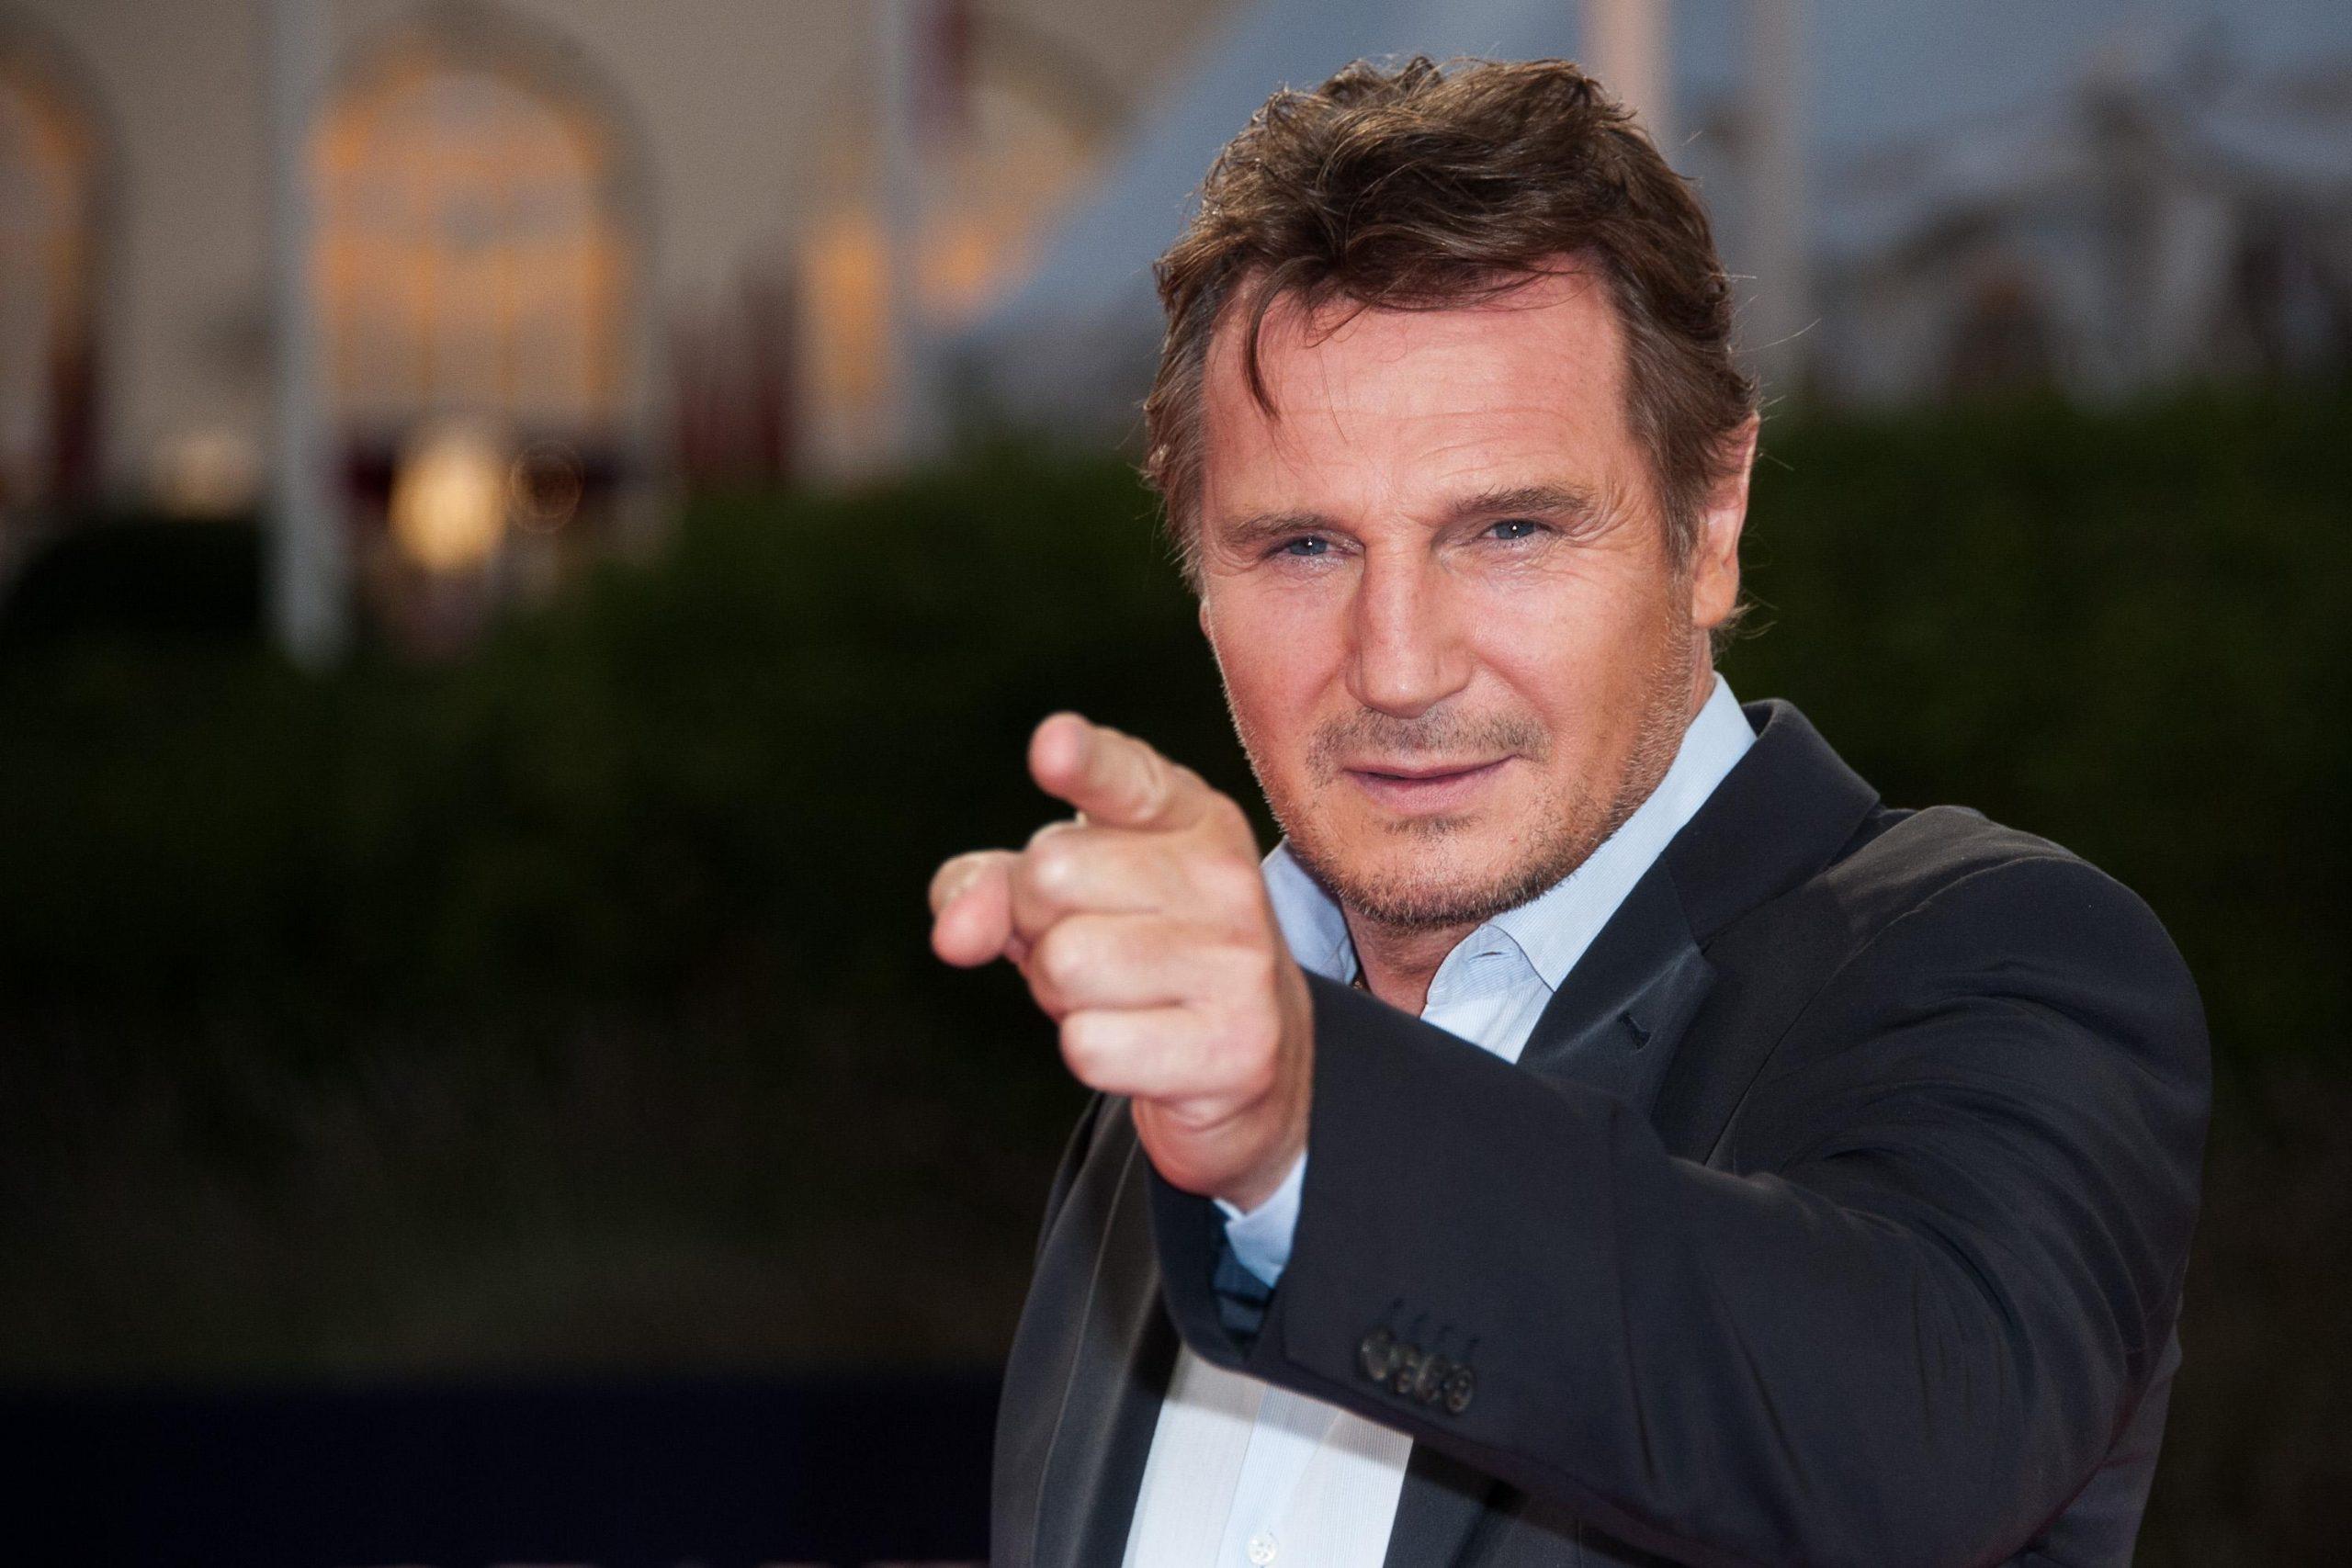 Liam Neeson as Magneto